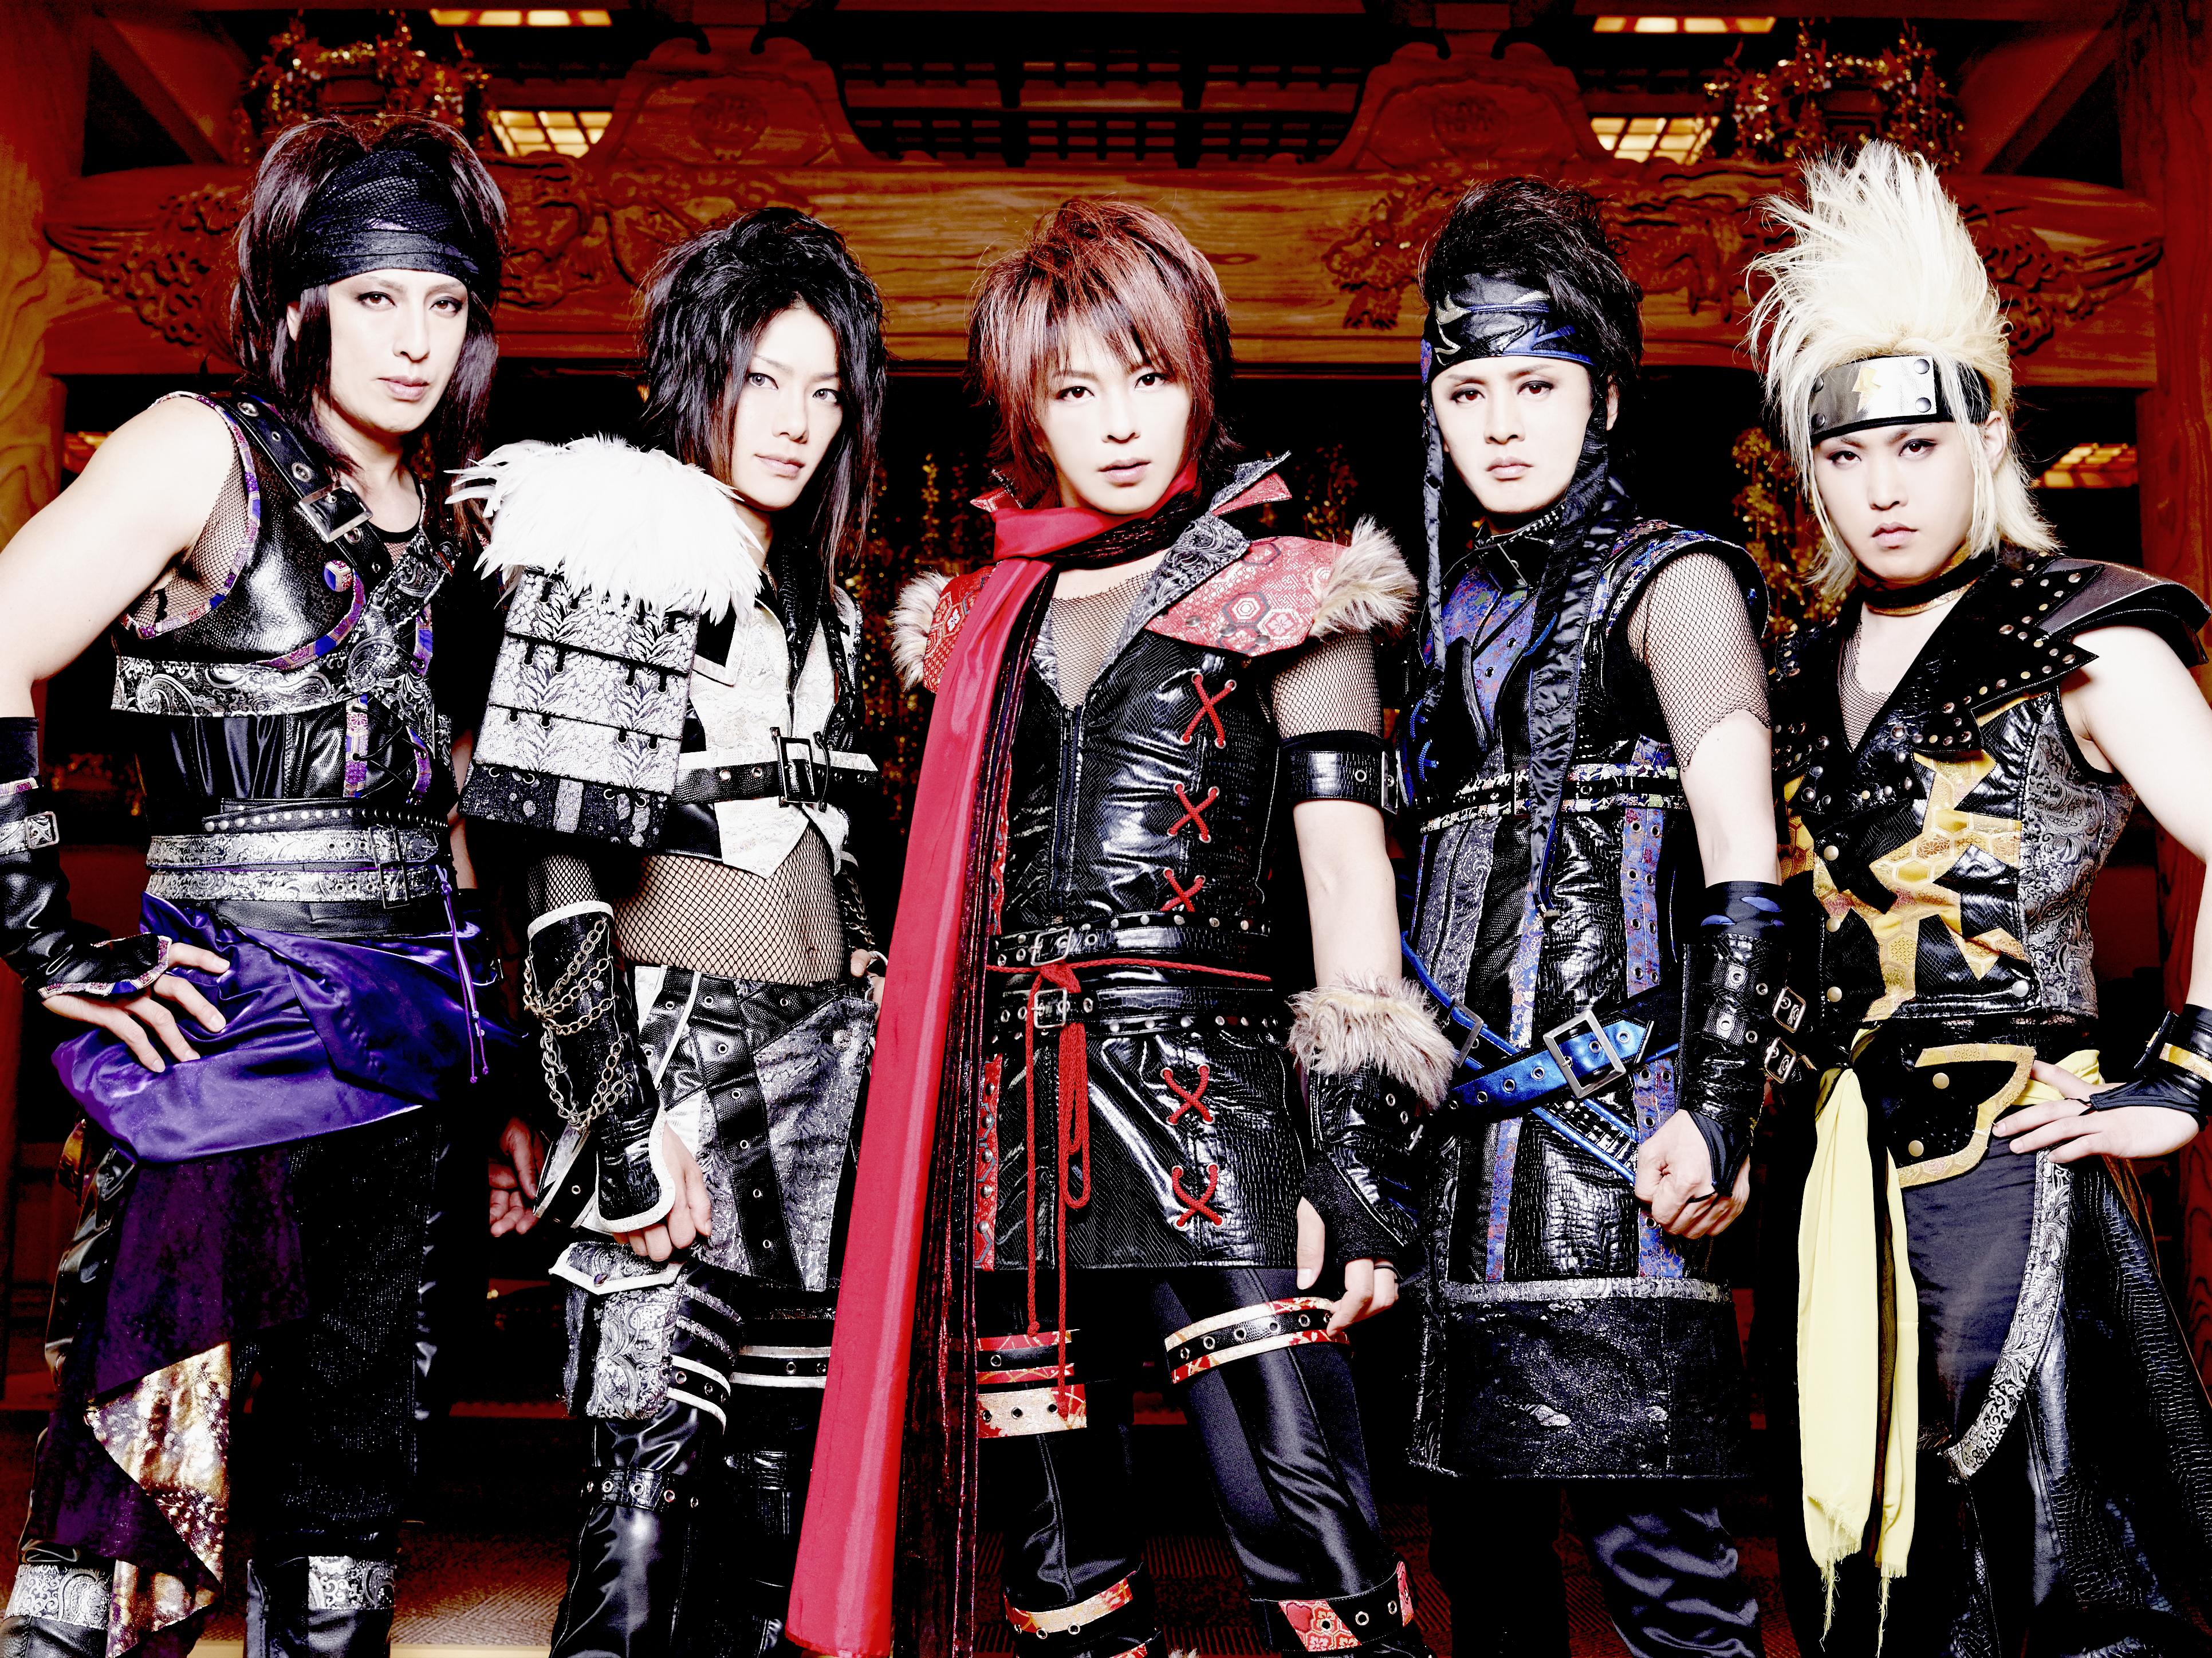 L→R Metal(Ba)、Daishi(Gu)、Sarino(Vo)、Lida(Gu)、Dewey(Dr)